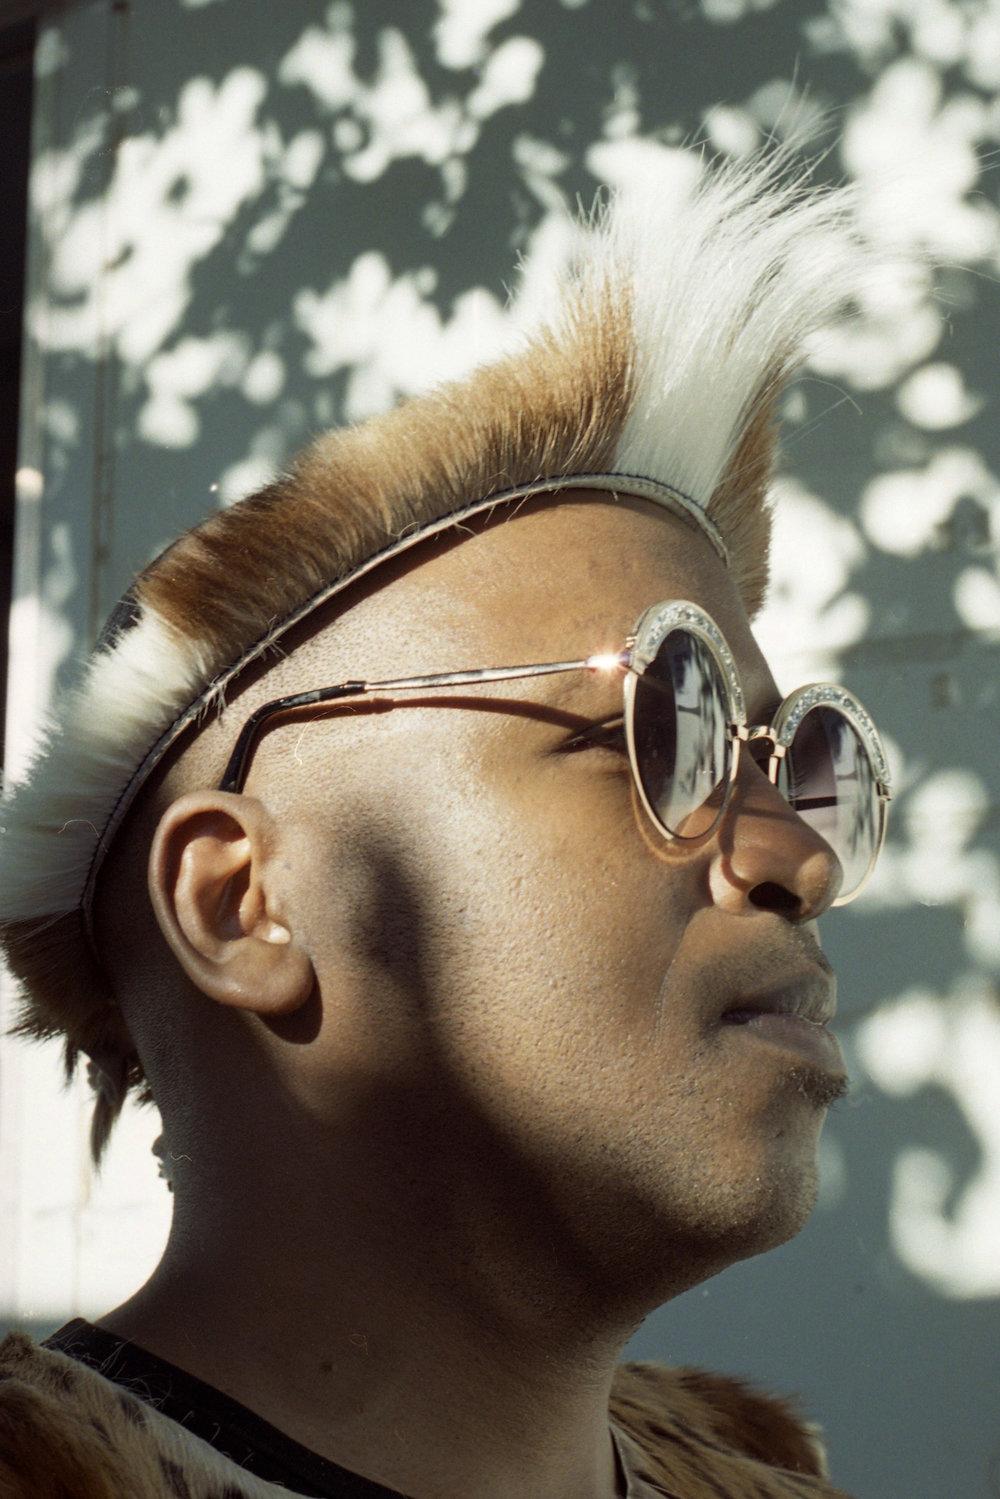 Spoek Mathambo, performer, representing Zulu